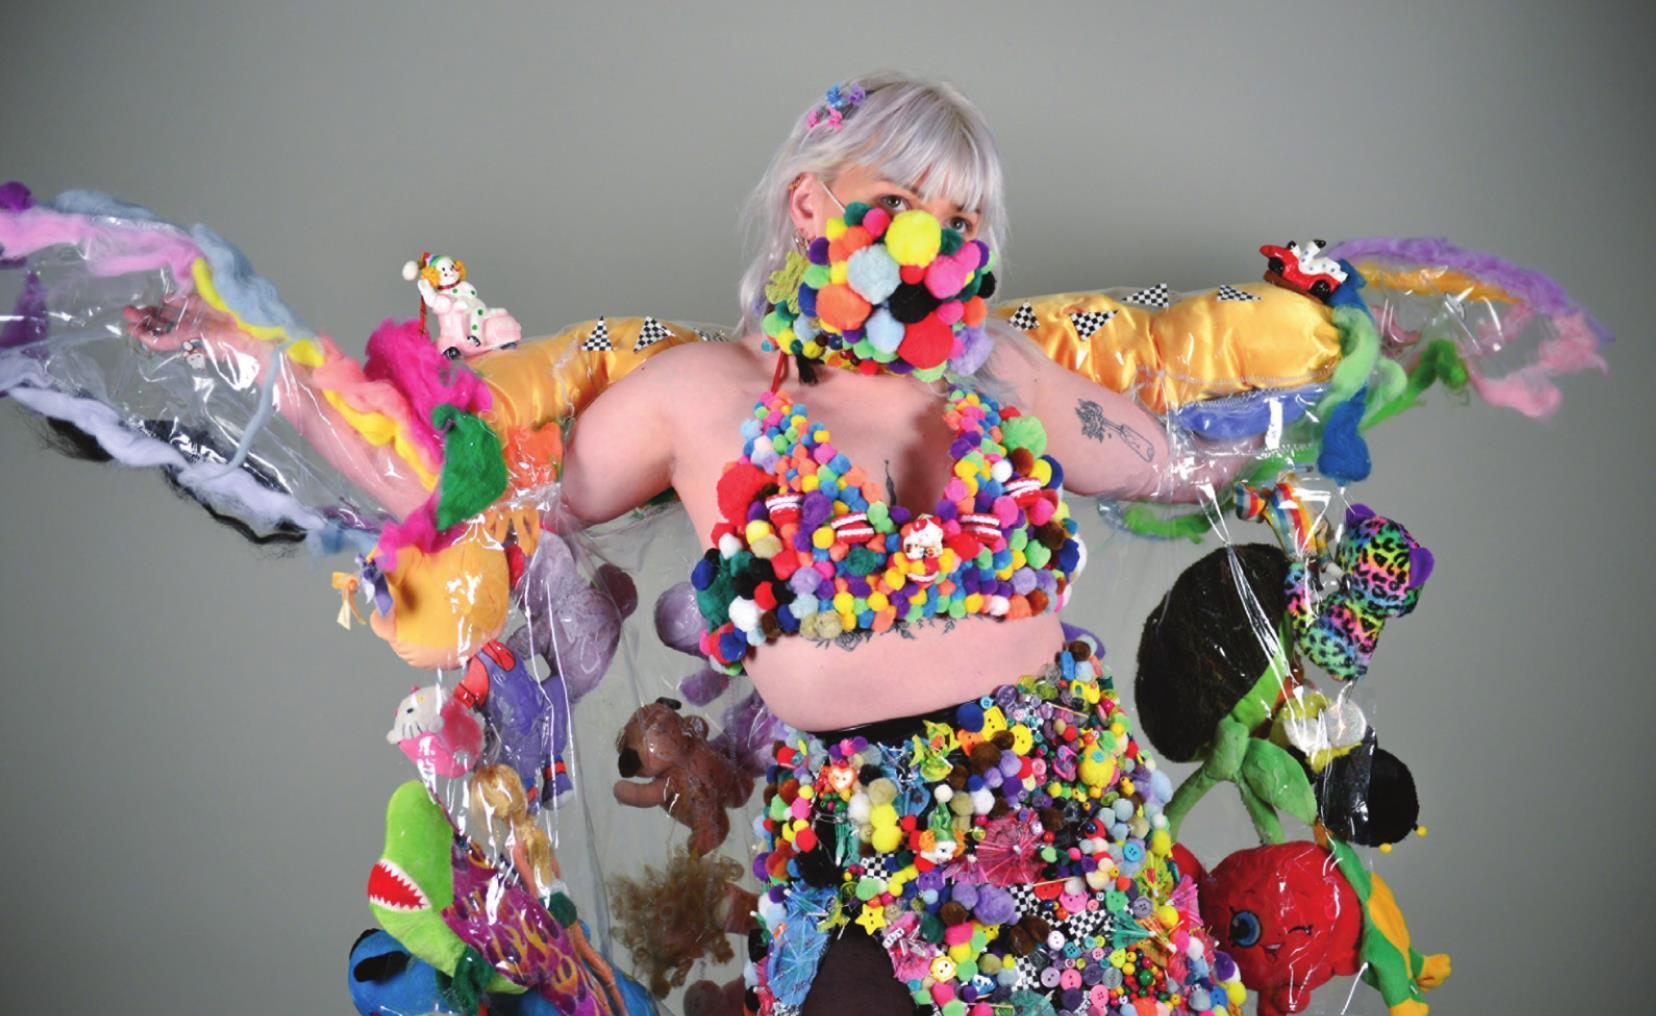 Texas State online art exhibit explores struggle between individual inspiration, societal expectation